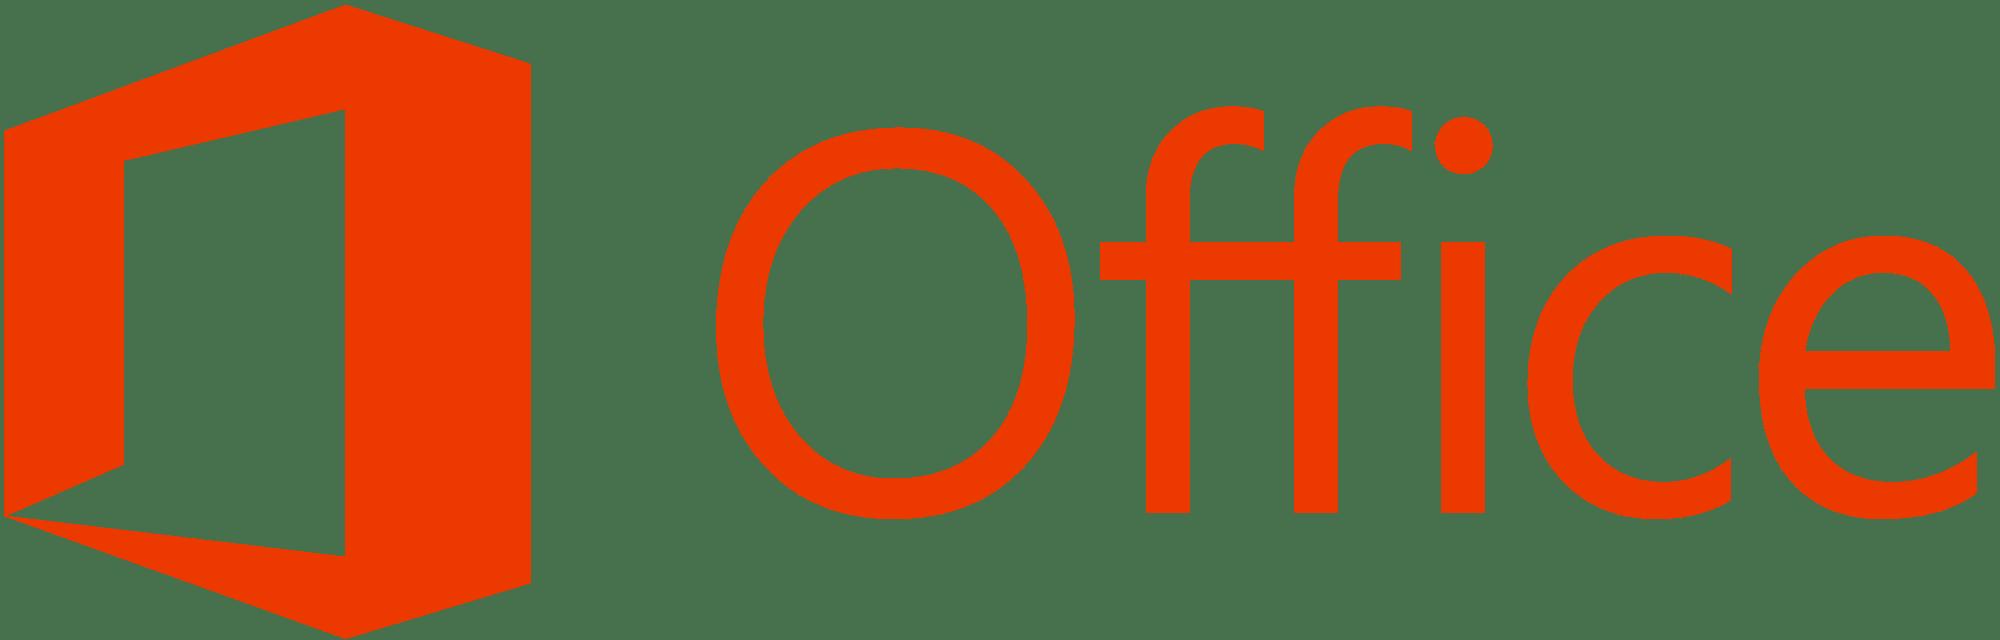 Office-2013-windows-10-3-min.png